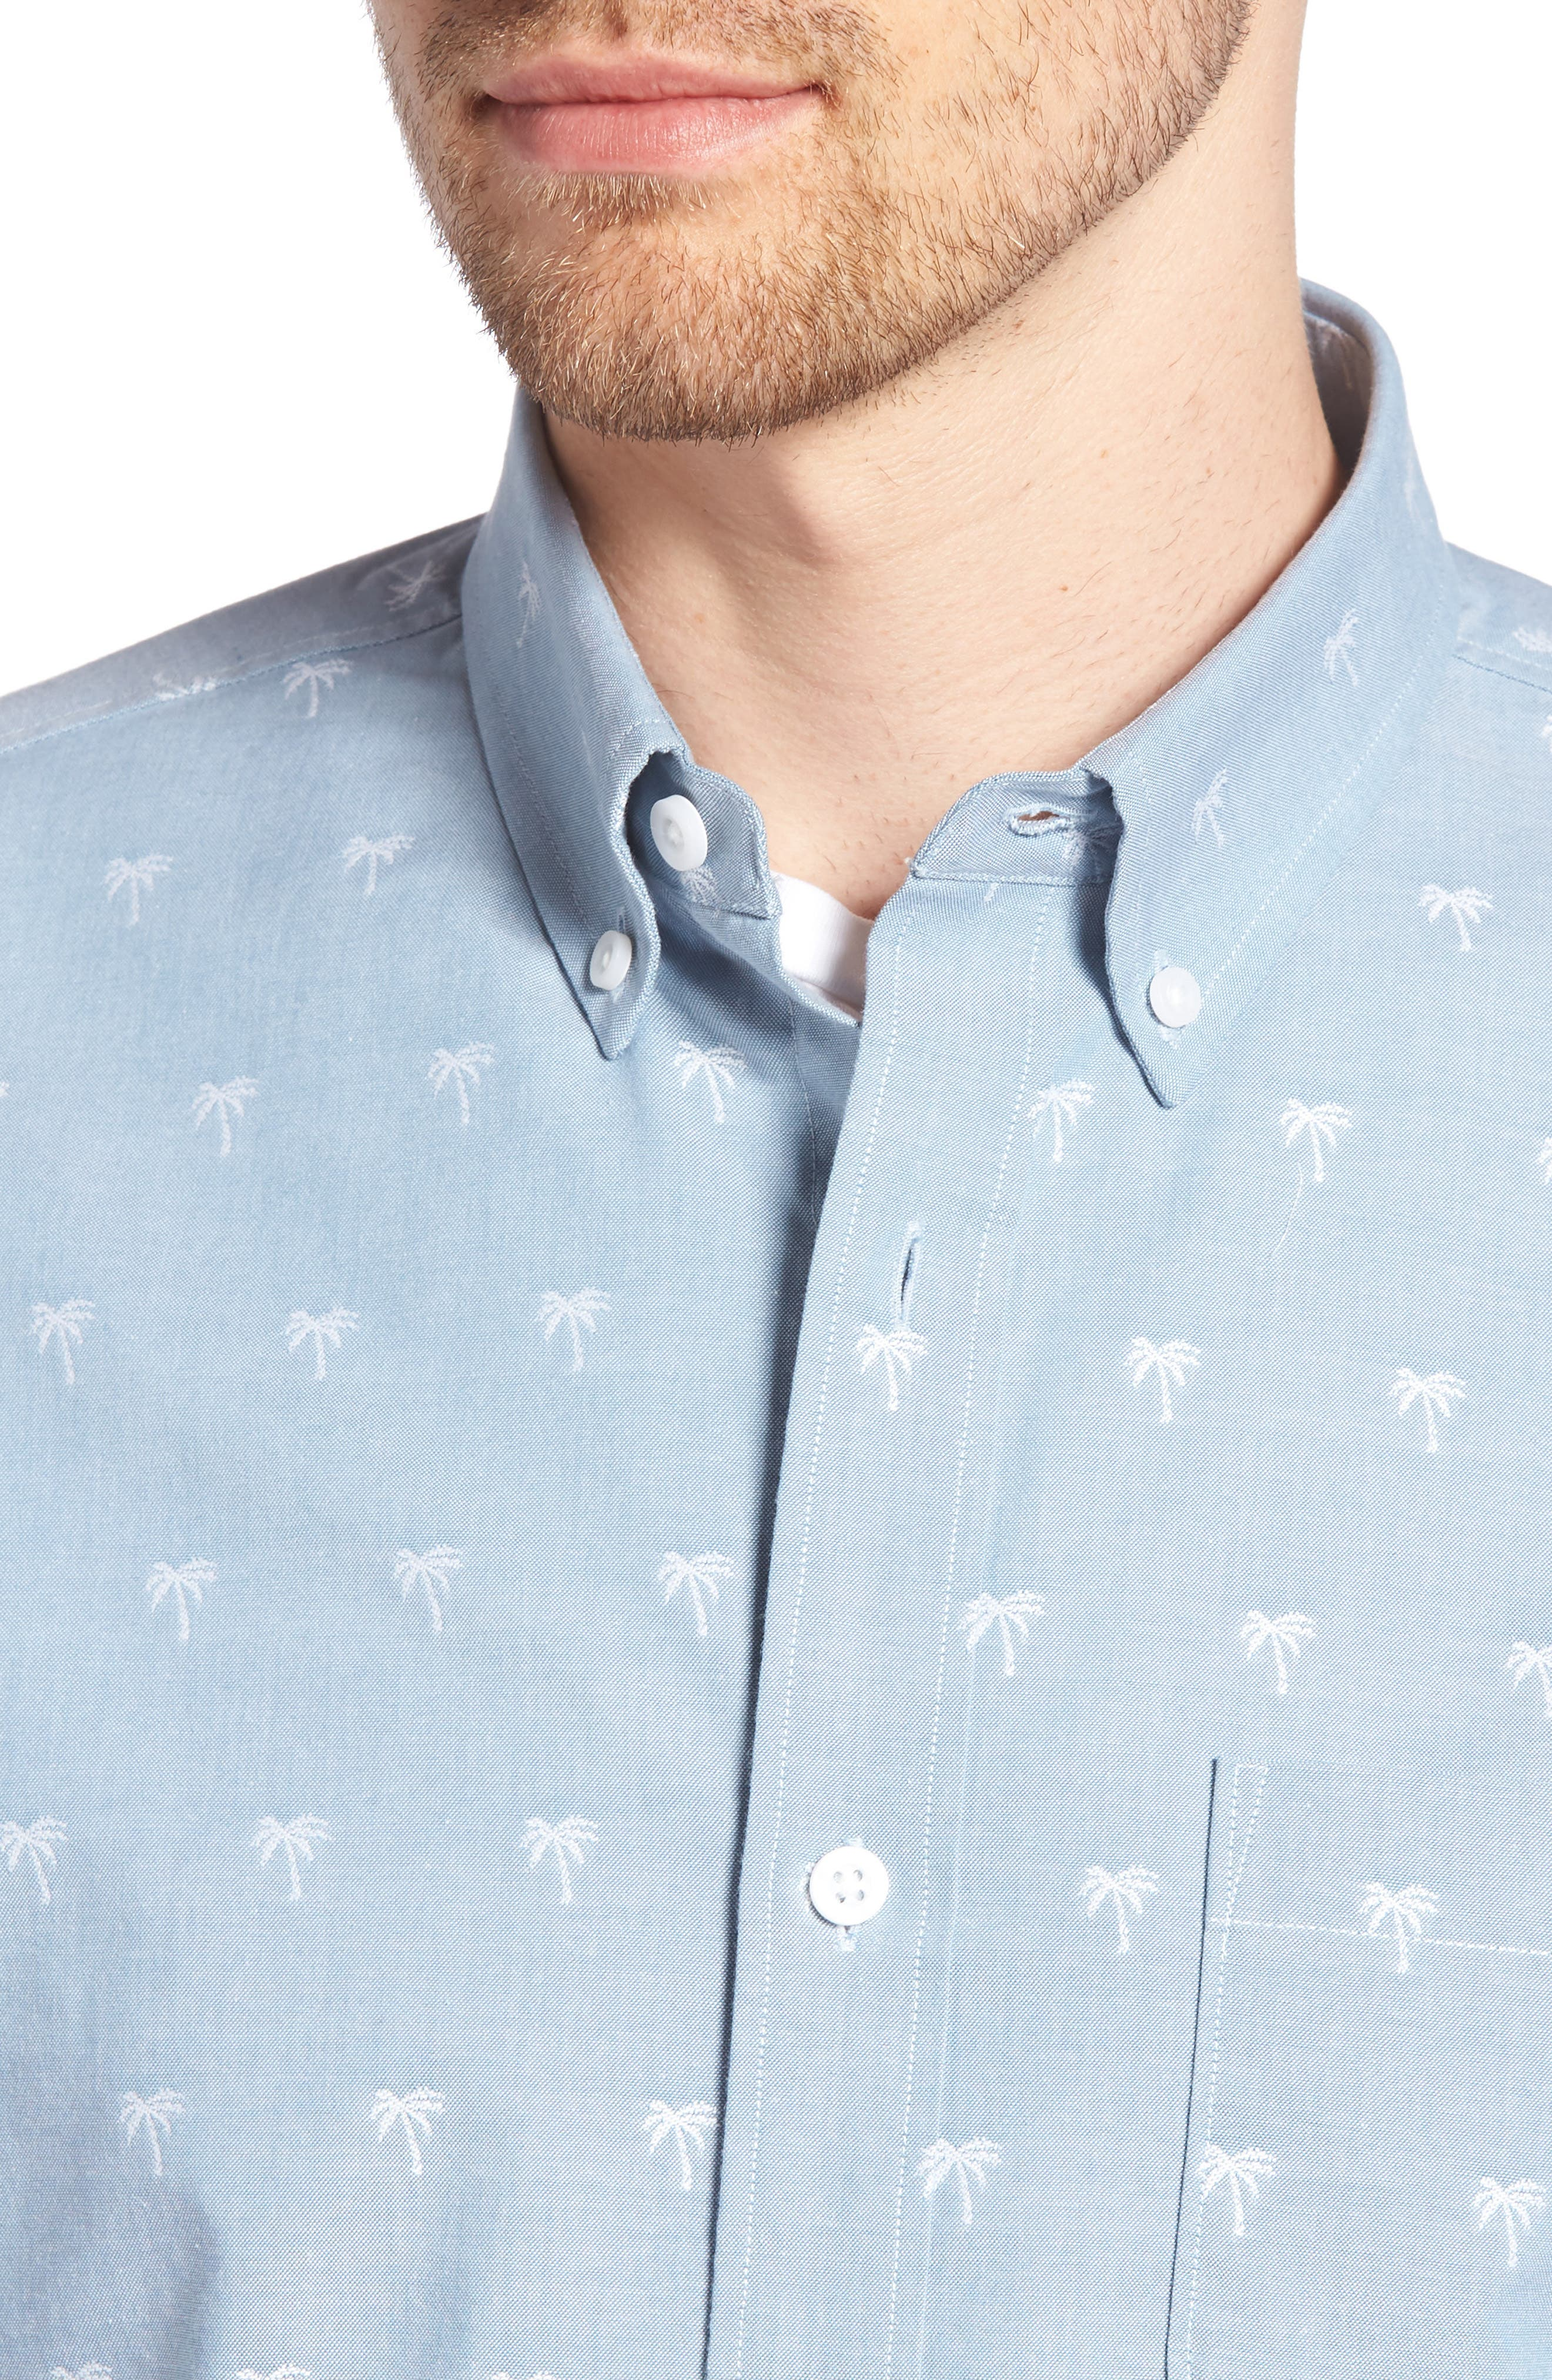 Trim Fit Print Chambray Sport Shirt,                             Alternate thumbnail 2, color,                             Blue Chambray Palm Trees